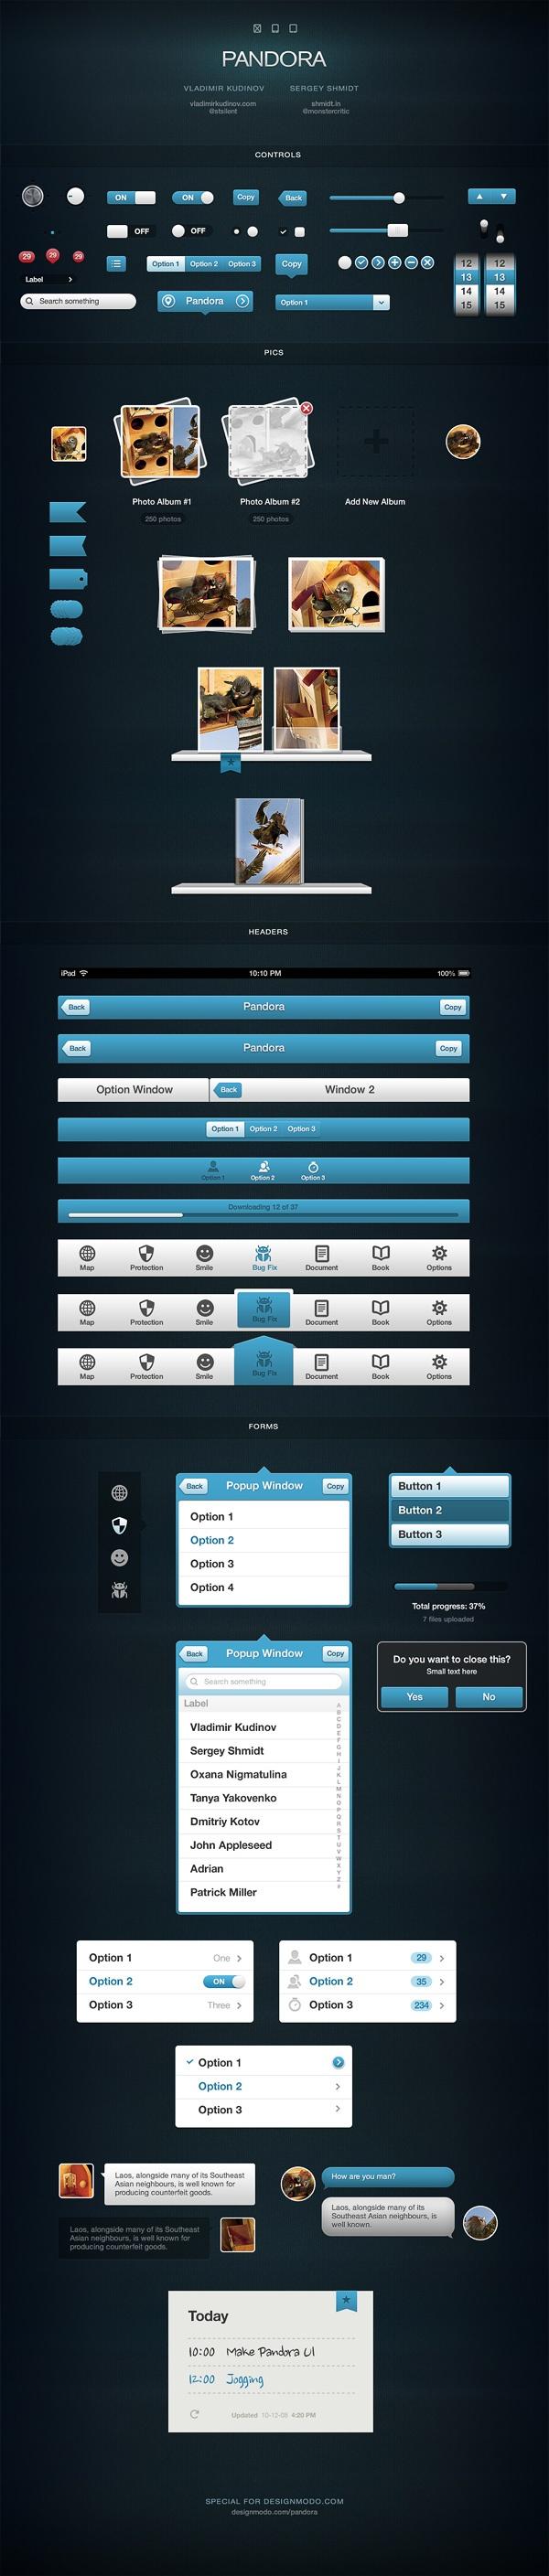 iOS UI Pack